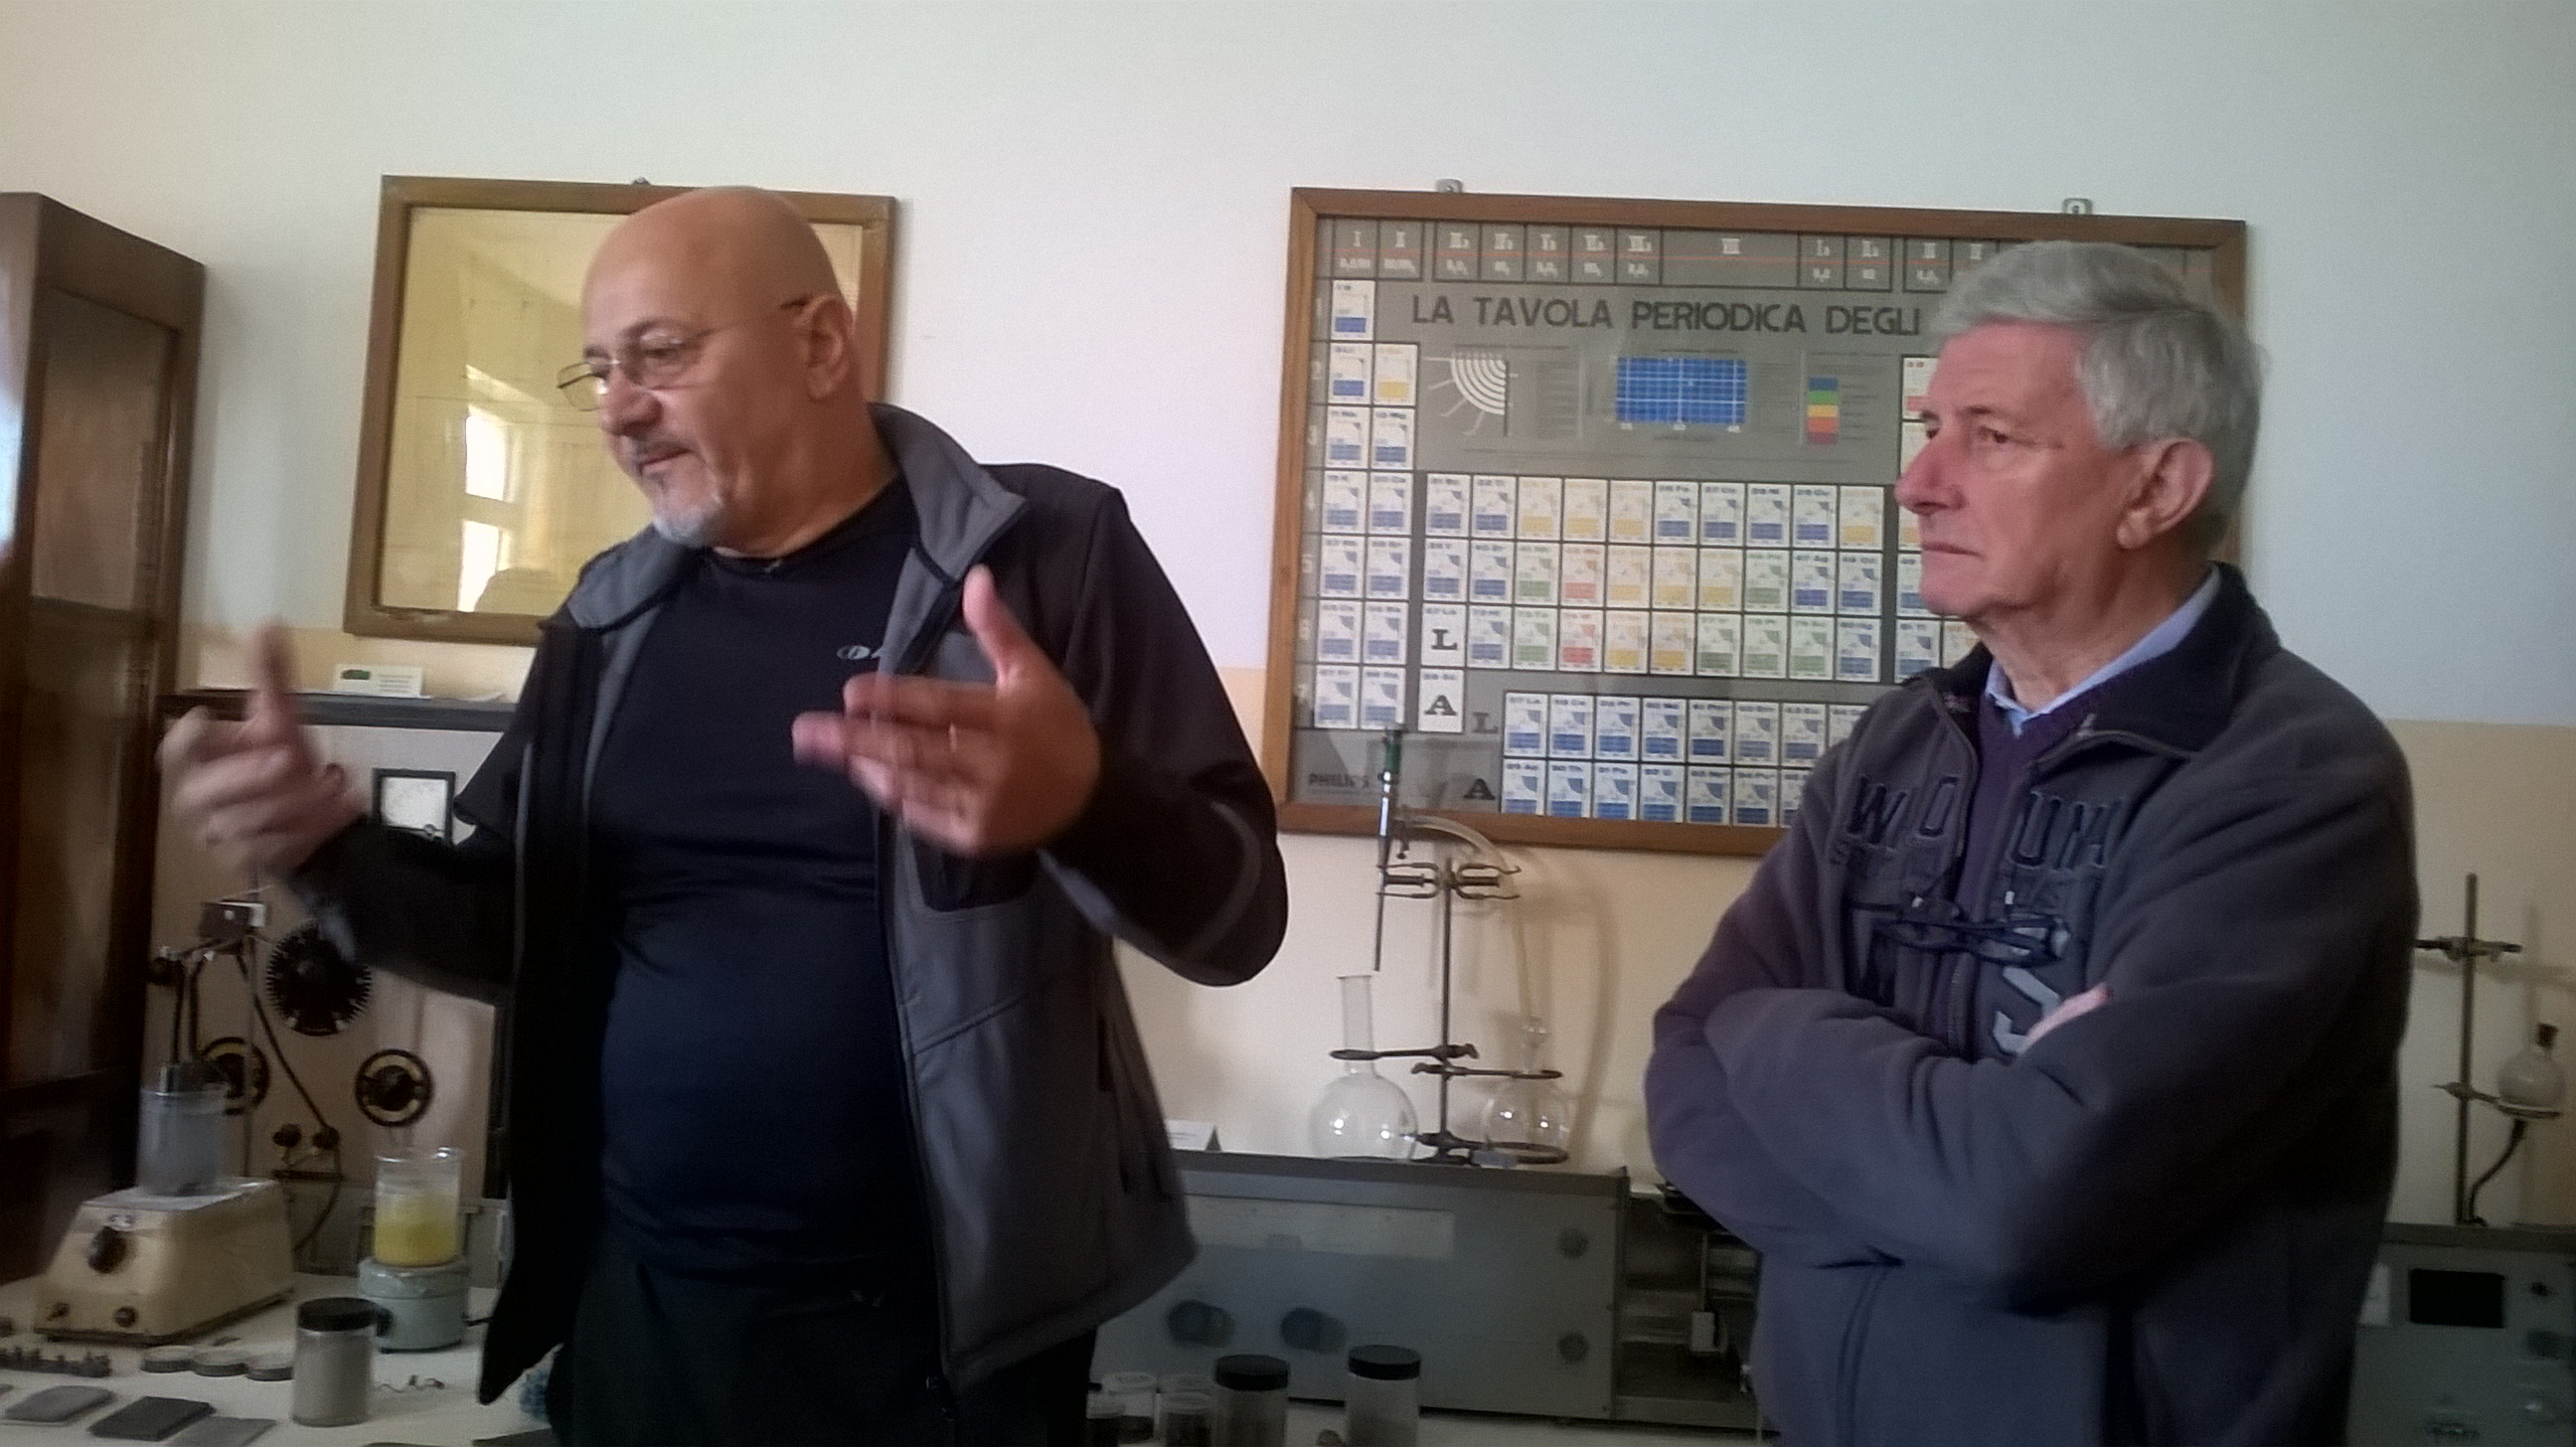 50_ITM 2016 Gorno_visita museo